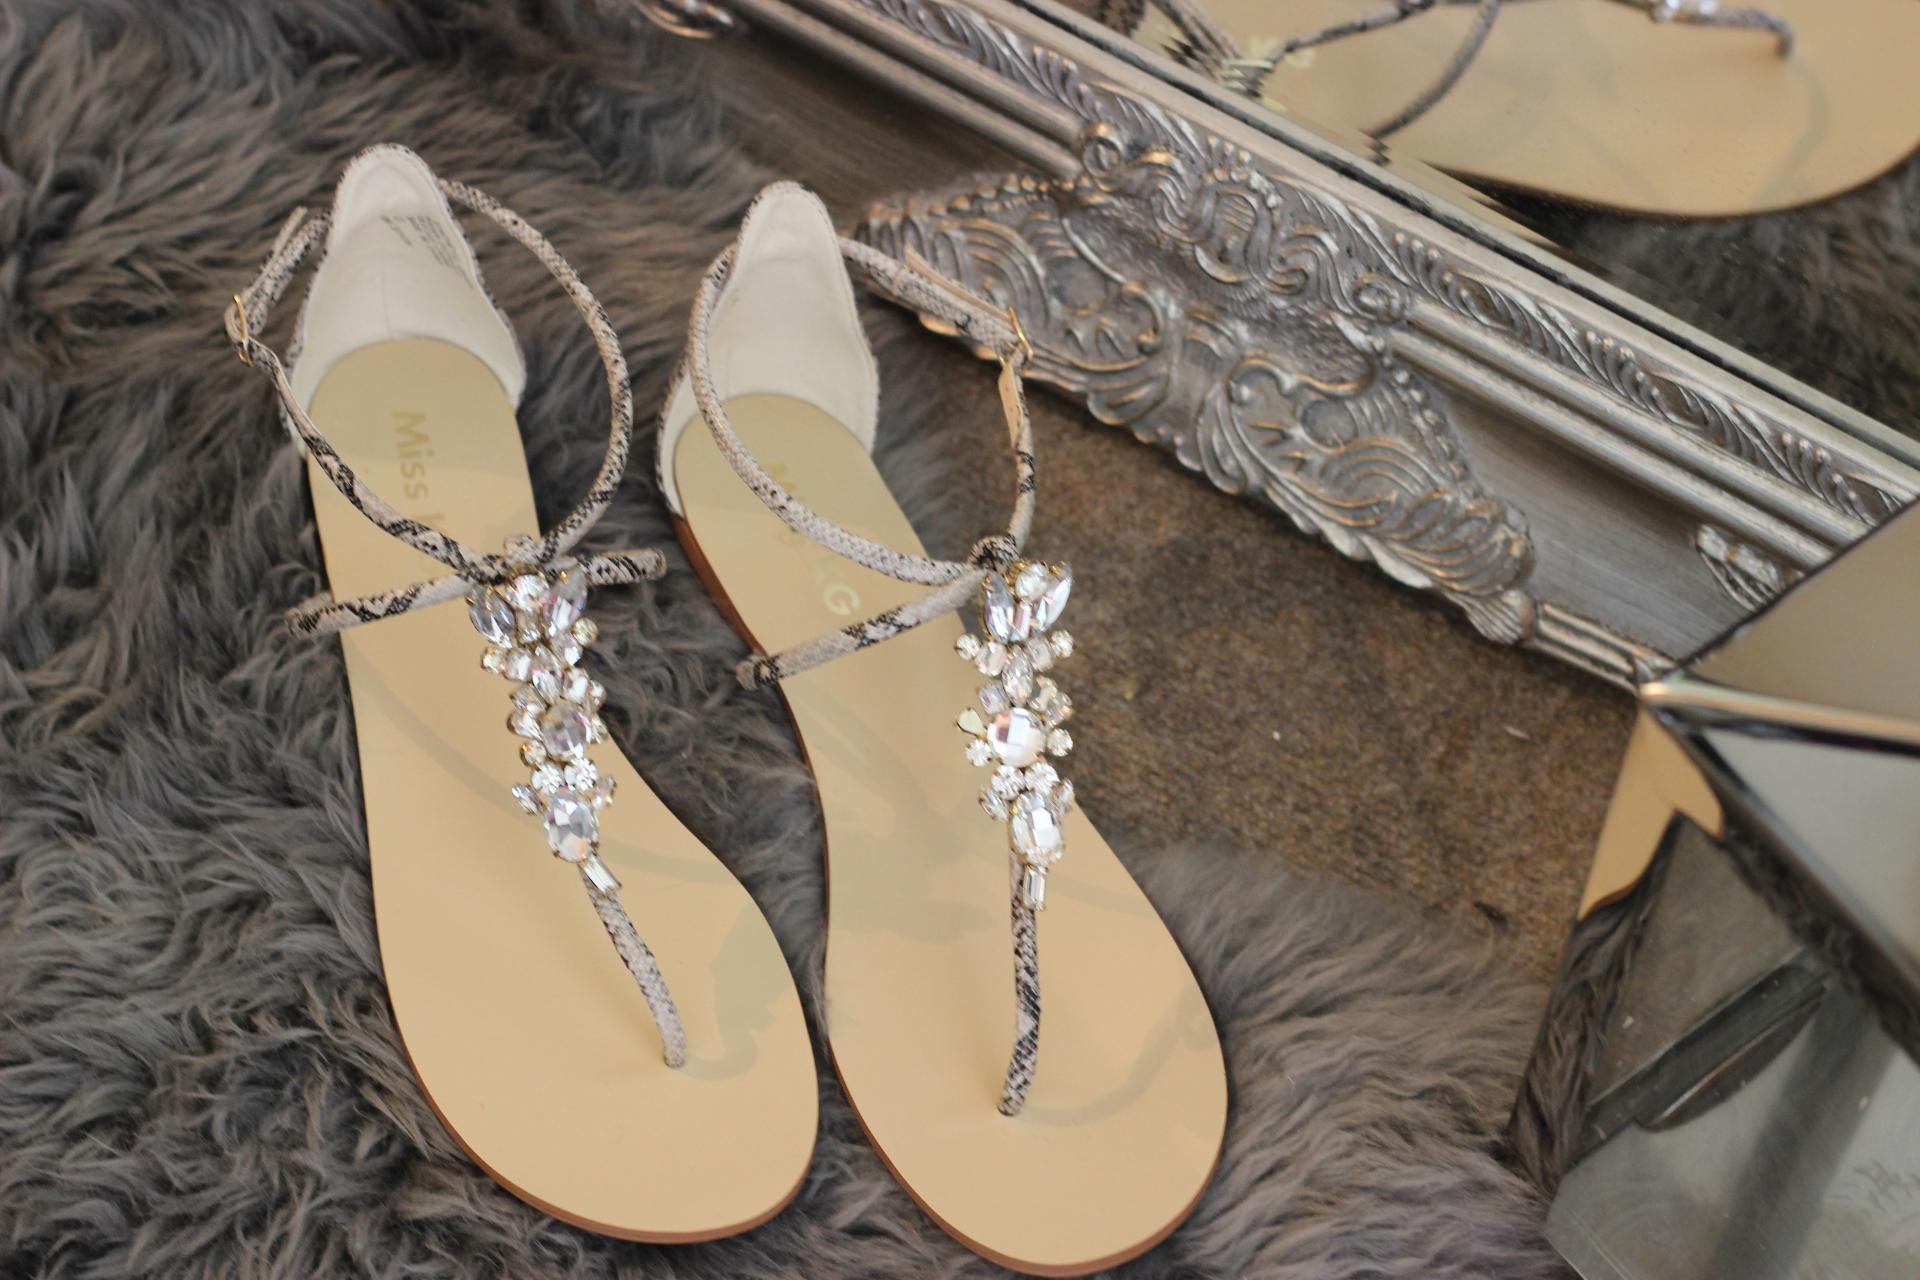 Girl In The Mirror - The Summer Maxi Dress Kurt Geiger Delight Sandals